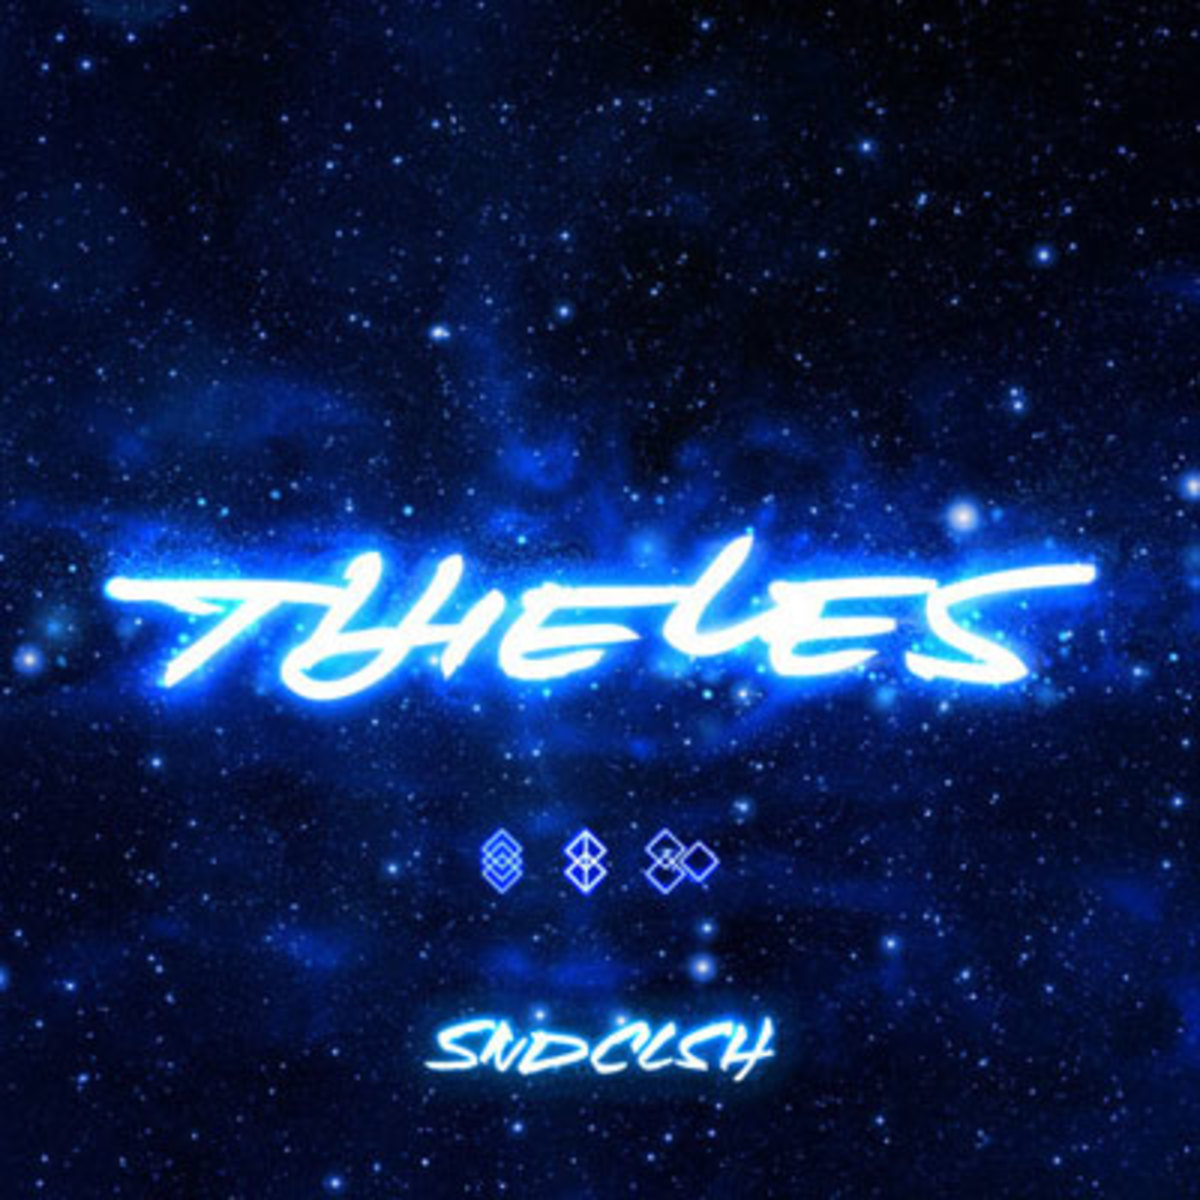 sndclsh-theives.jpg